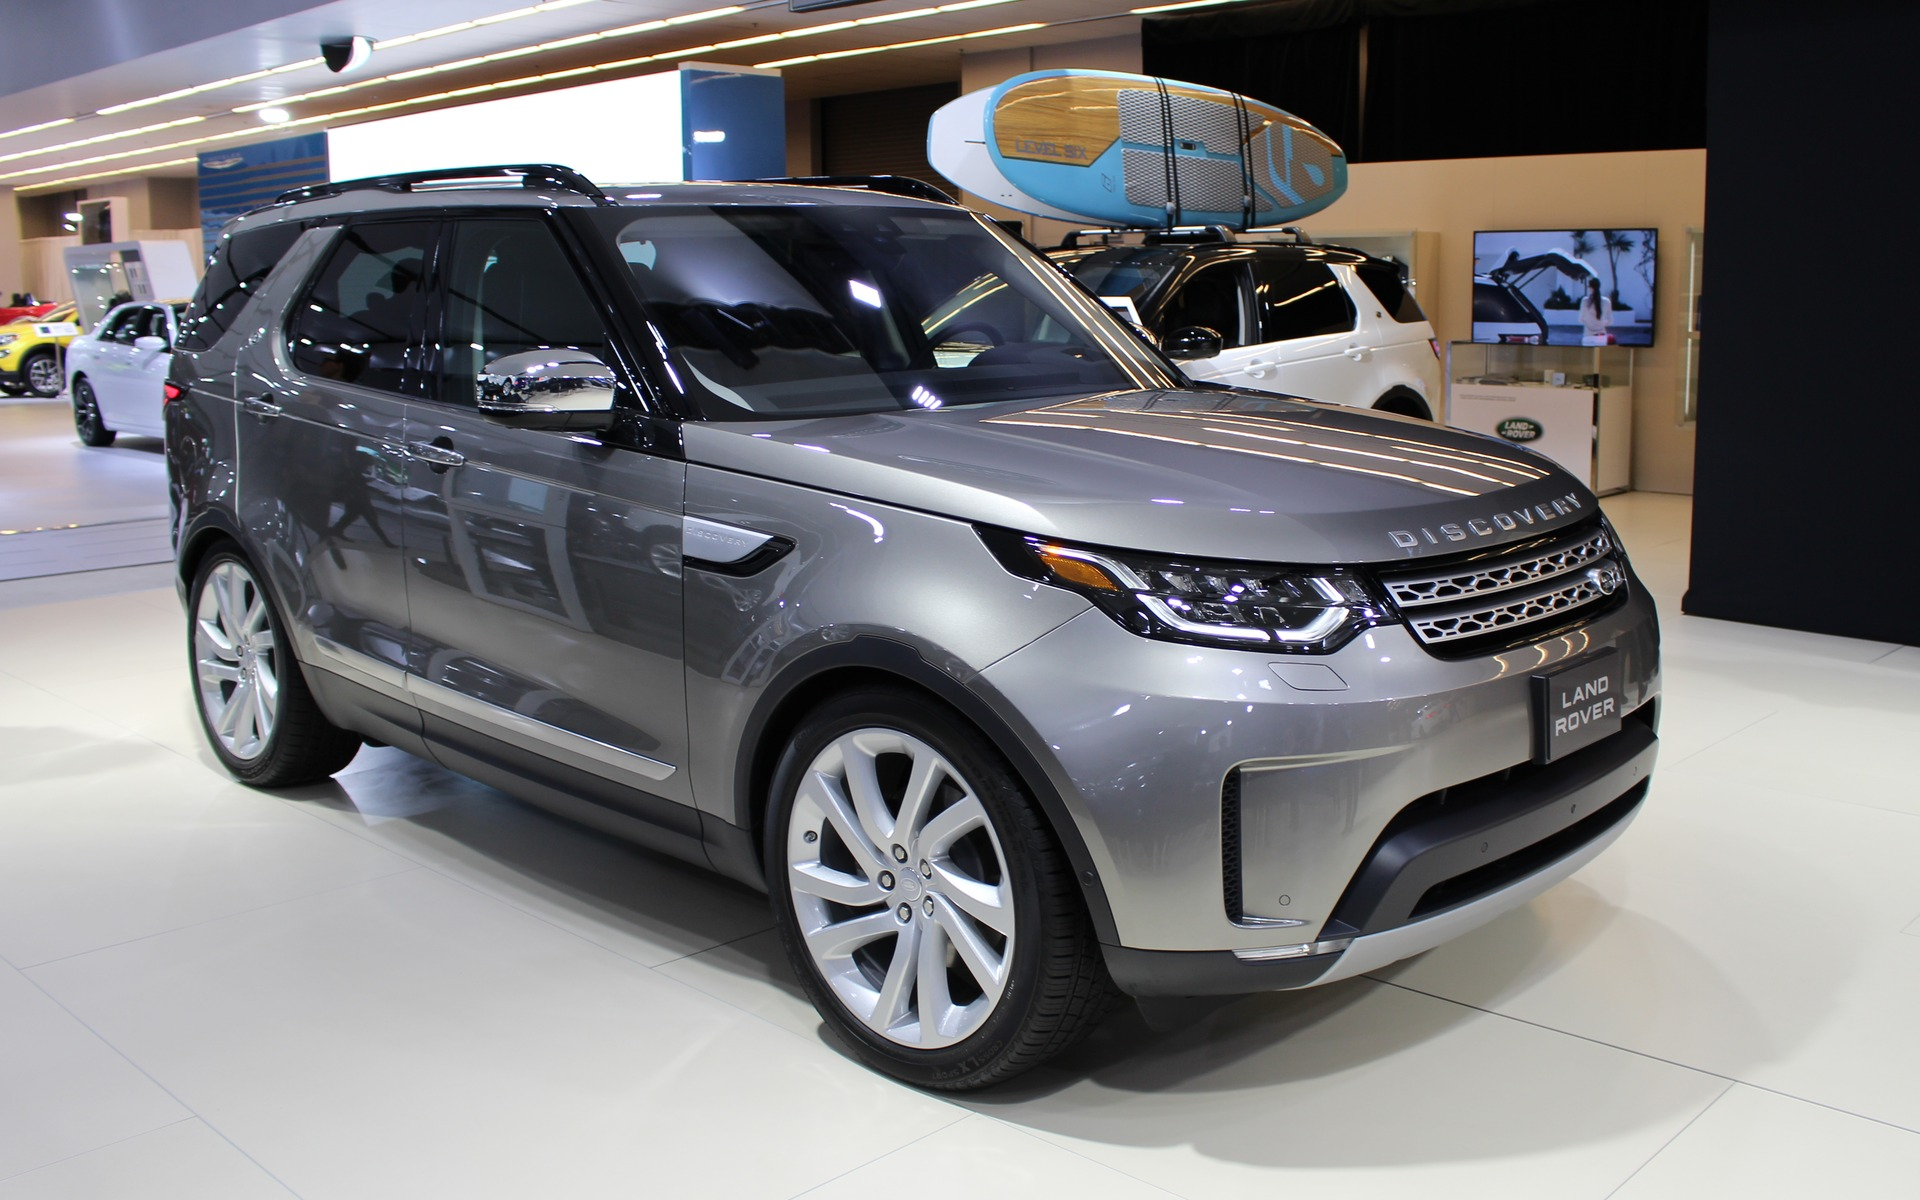 2017 Land Rover Discovery Photos 1 7 The Car Guide